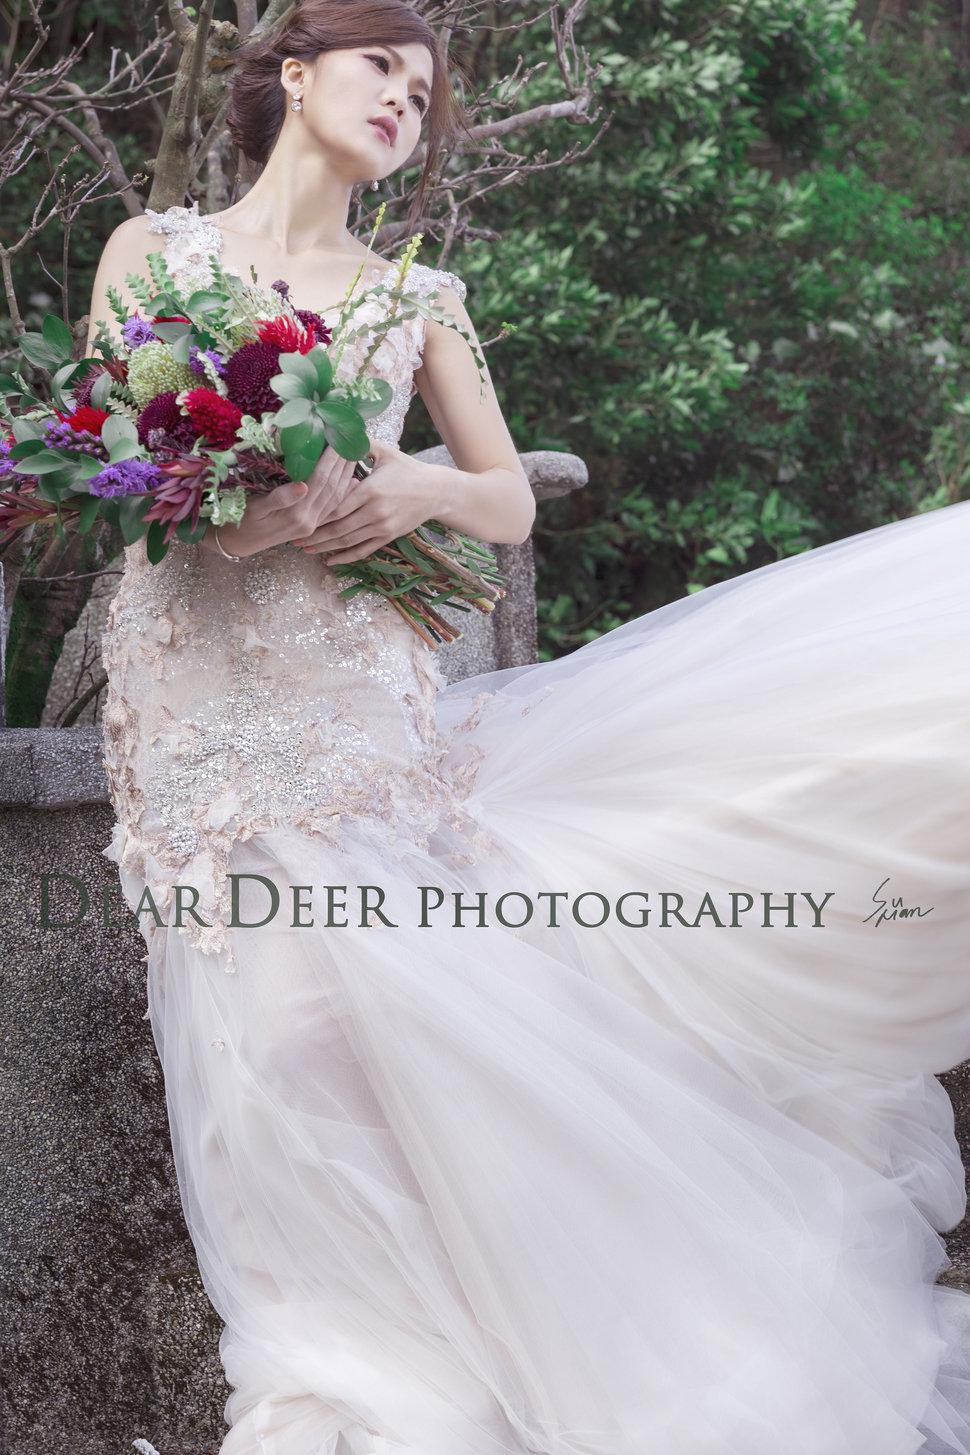 Dear Deer|花草仙女風格(編號:1280311) - Dear Deer鹿兒攝影|女攝影師蘇蔓 - 結婚吧